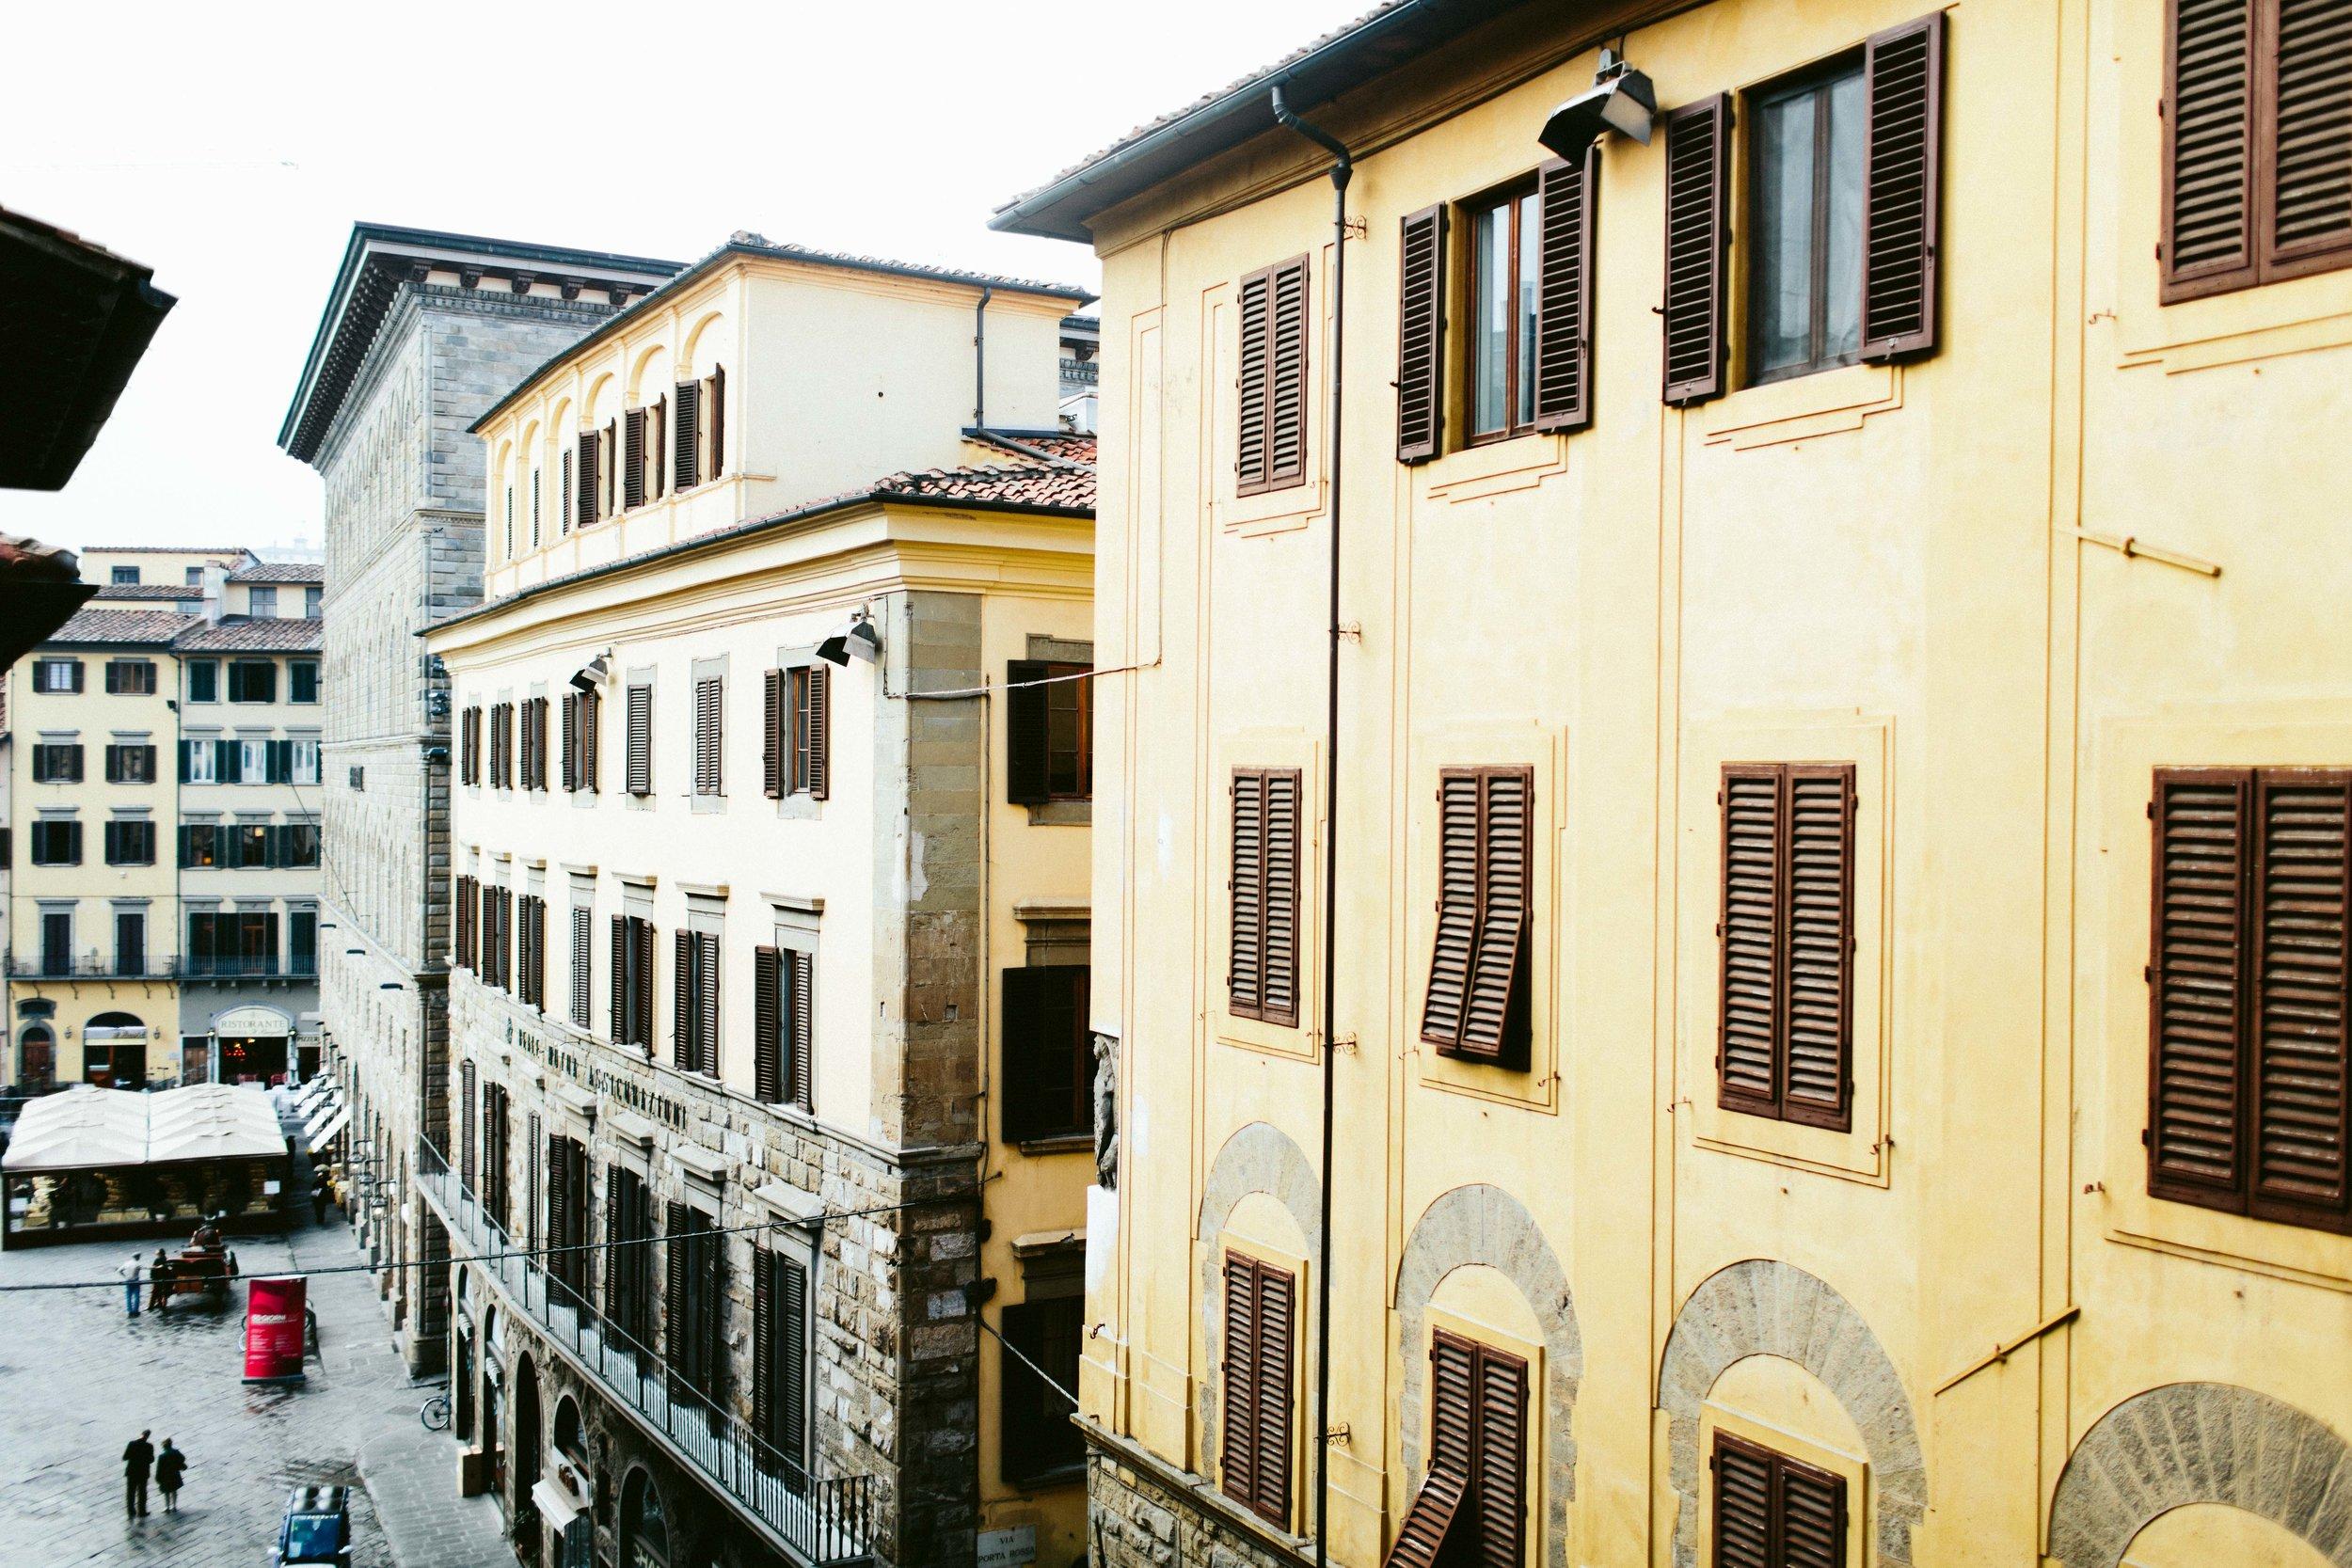 ITALY2015-498-3.jpg